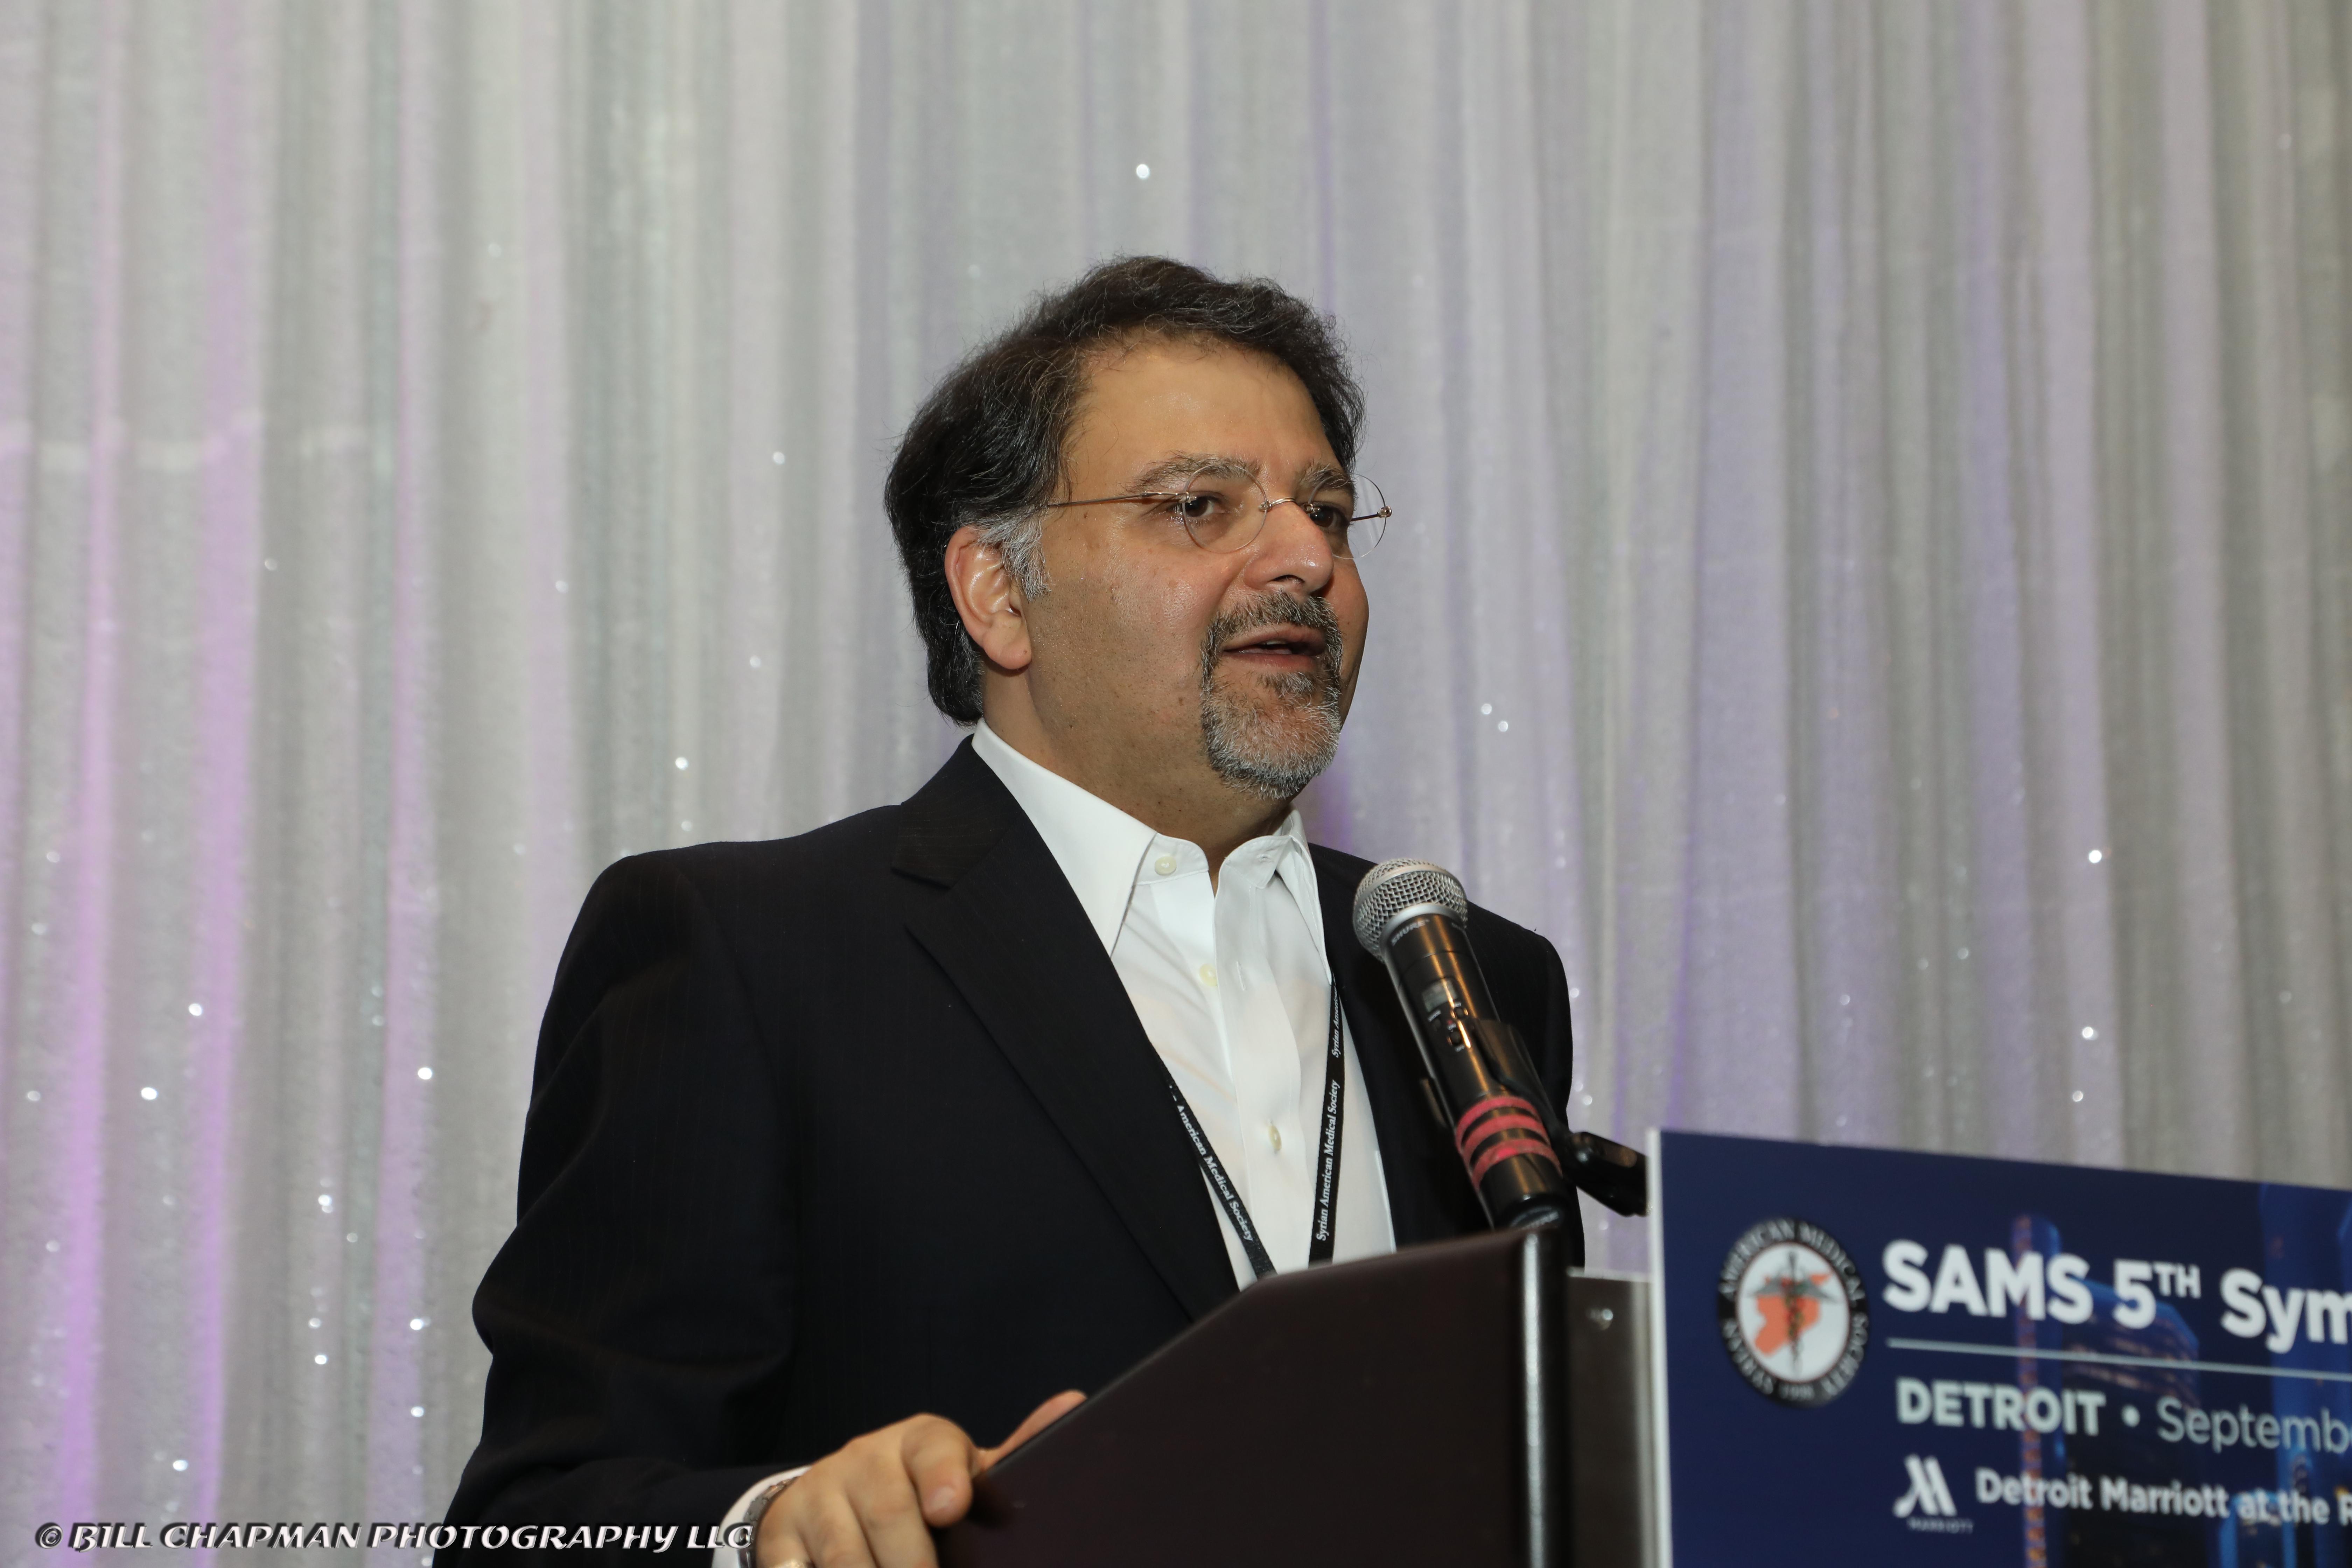 Dr. Maher Azouz